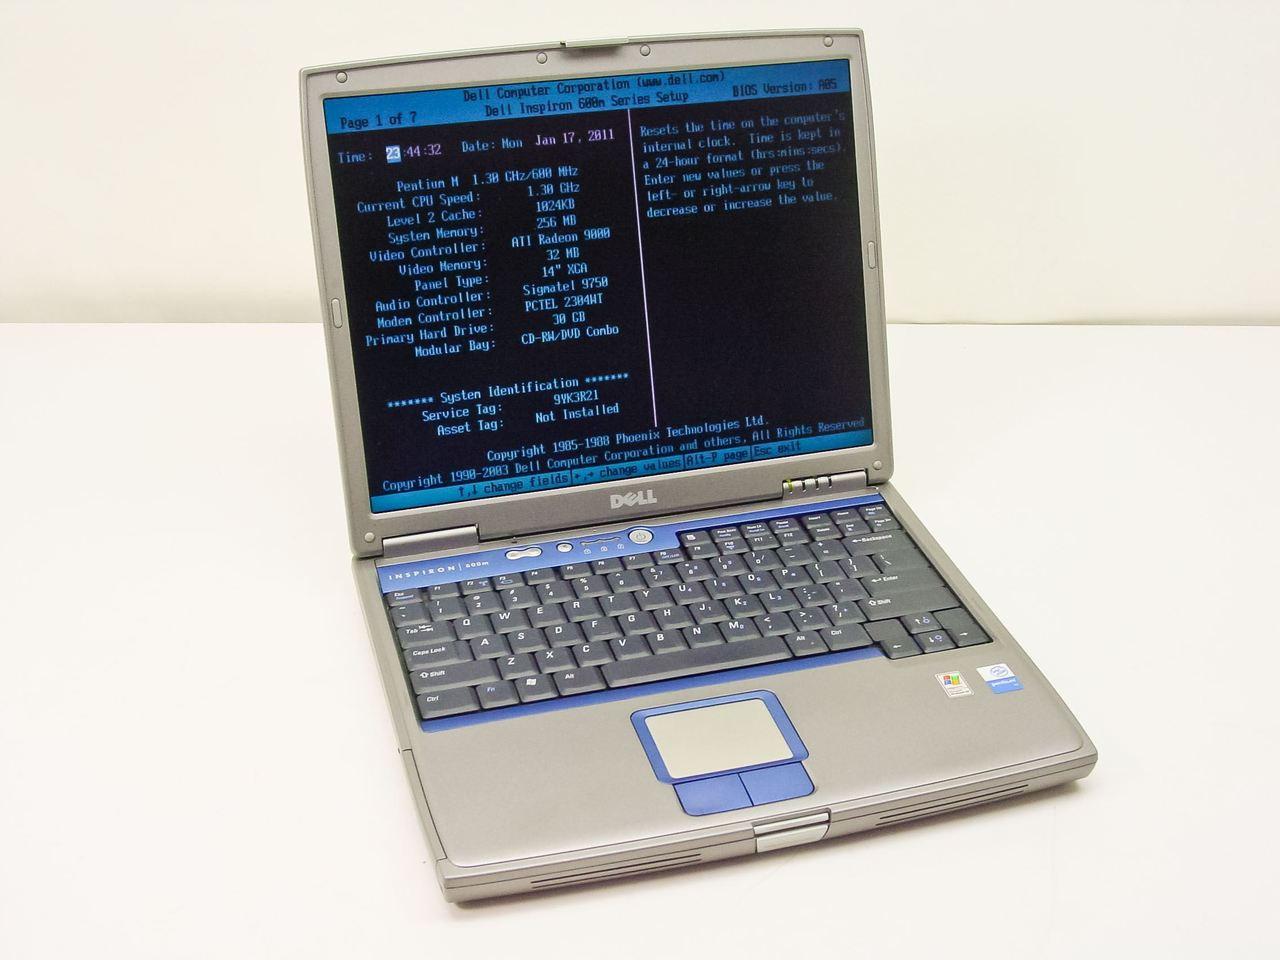 Dell Pentium M 1.30GHz, Laptop - AS IS Inspiron 600m ...